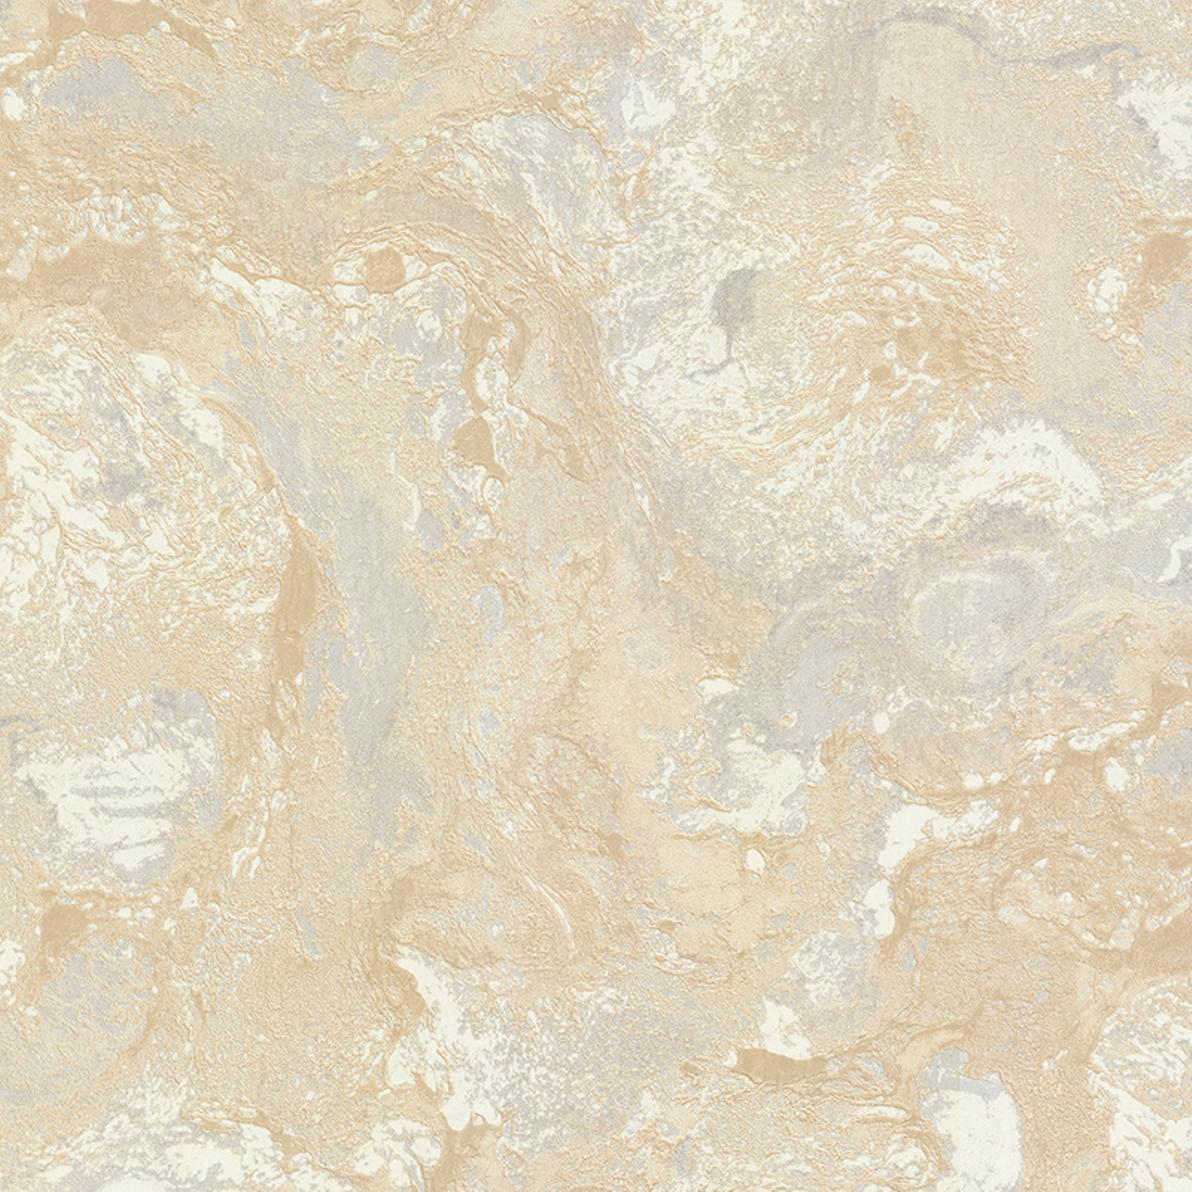 Обои Decori & Decori Carrara 82671